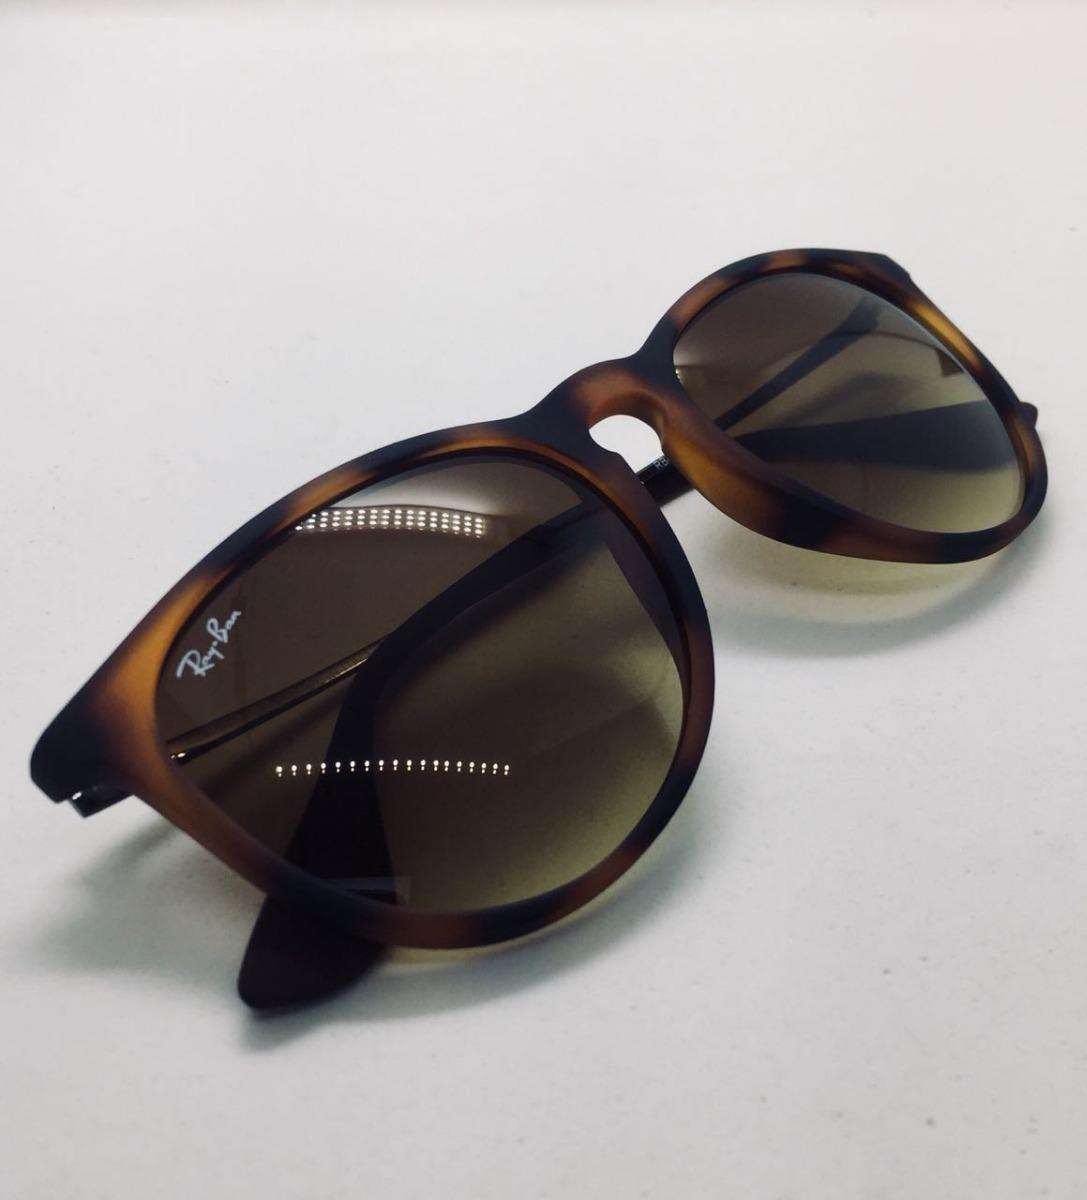 624a89090e265 Óculos Ray Ban Erika Rb 4171 Tartaruga Original Mais Brinde - R  220 ...